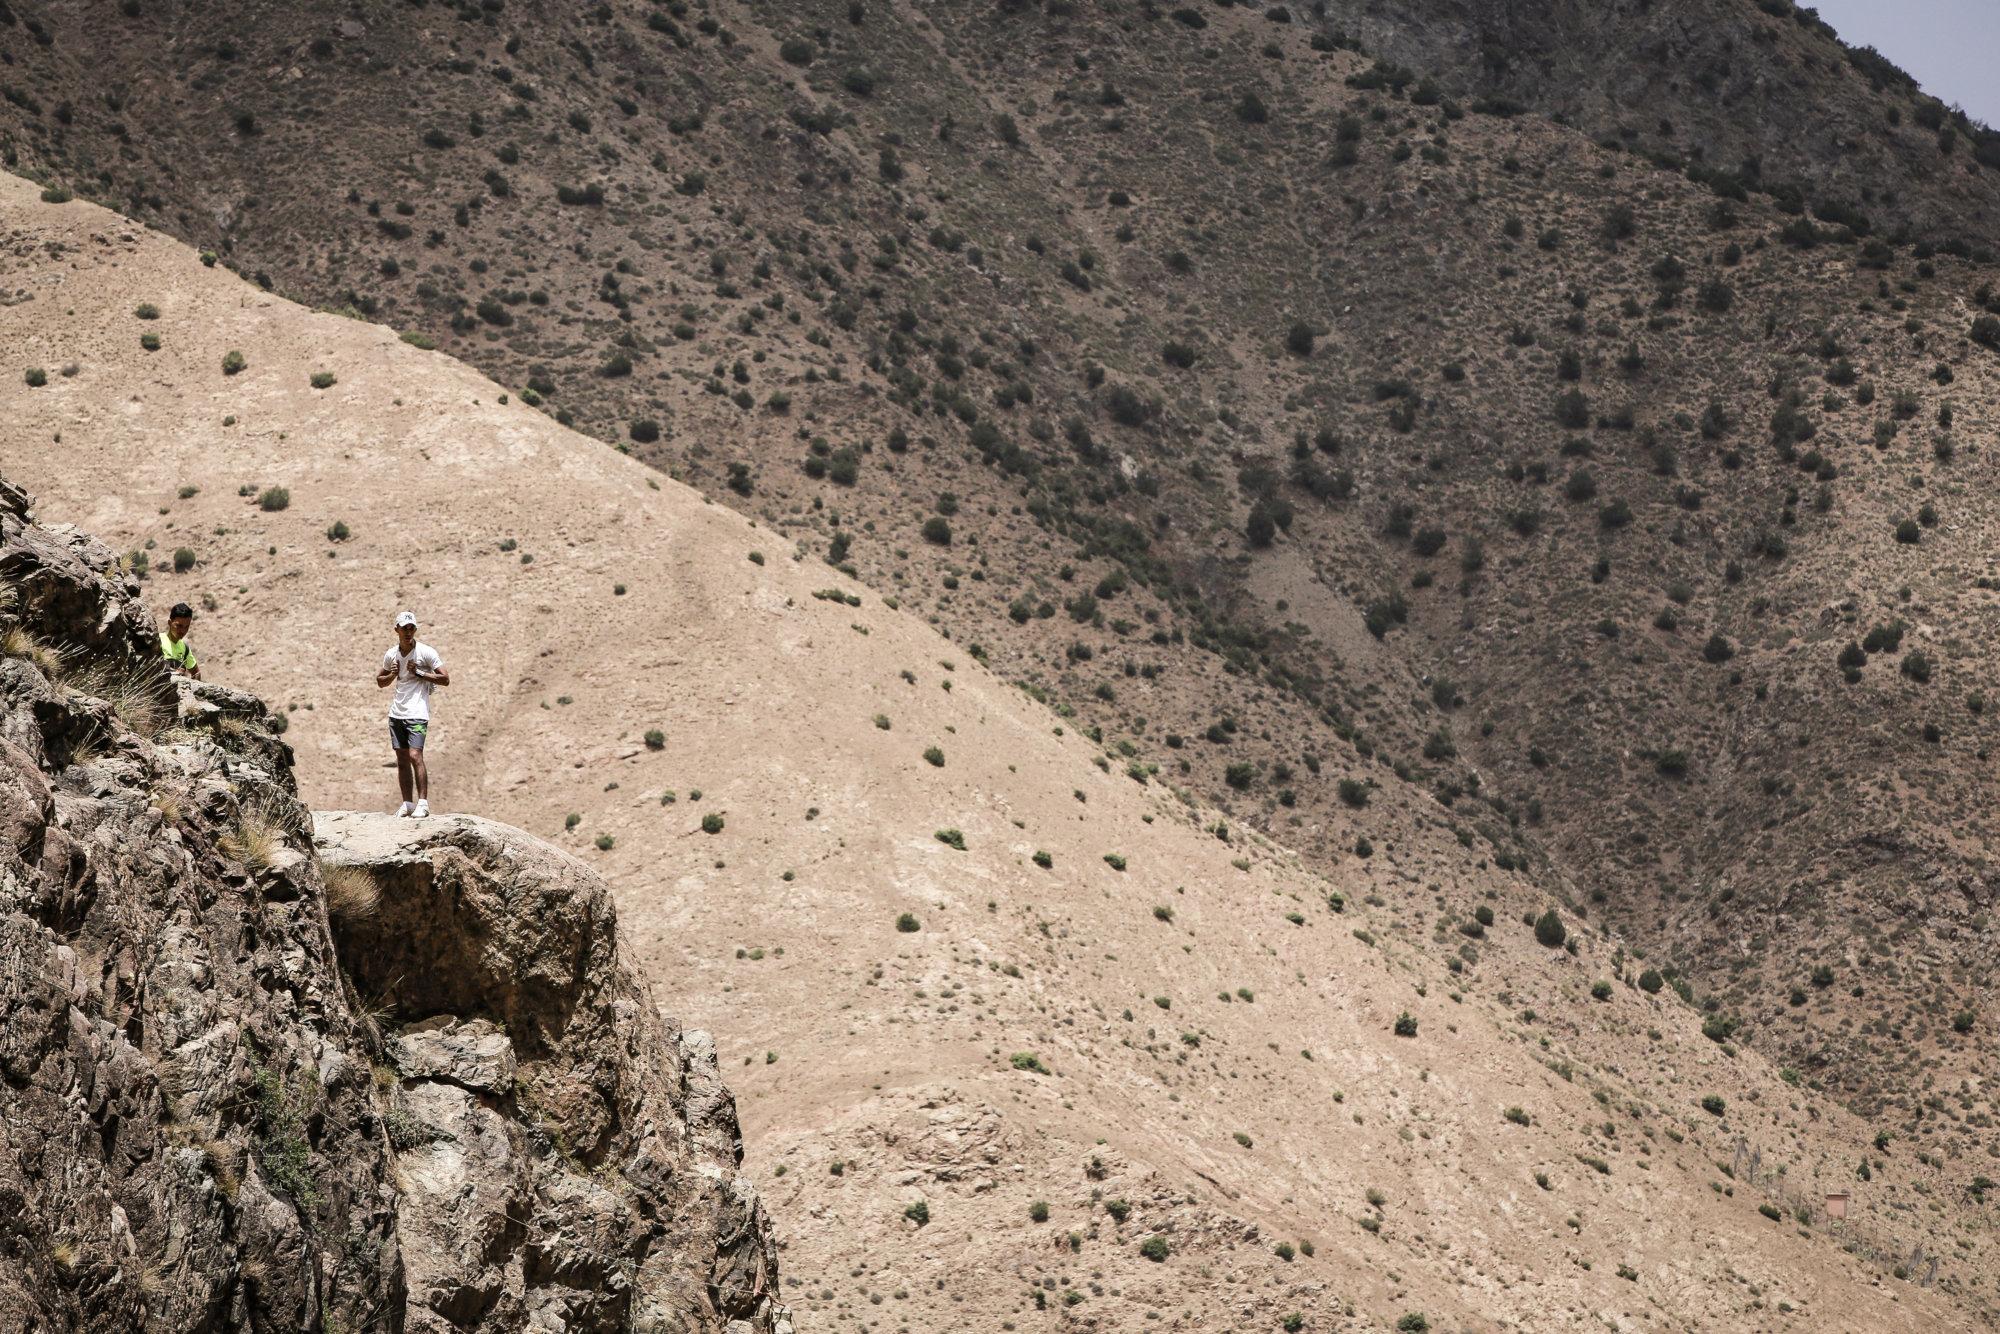 wasserfall-way-down-viewpoint-marokko-2016-mcu-ausflug